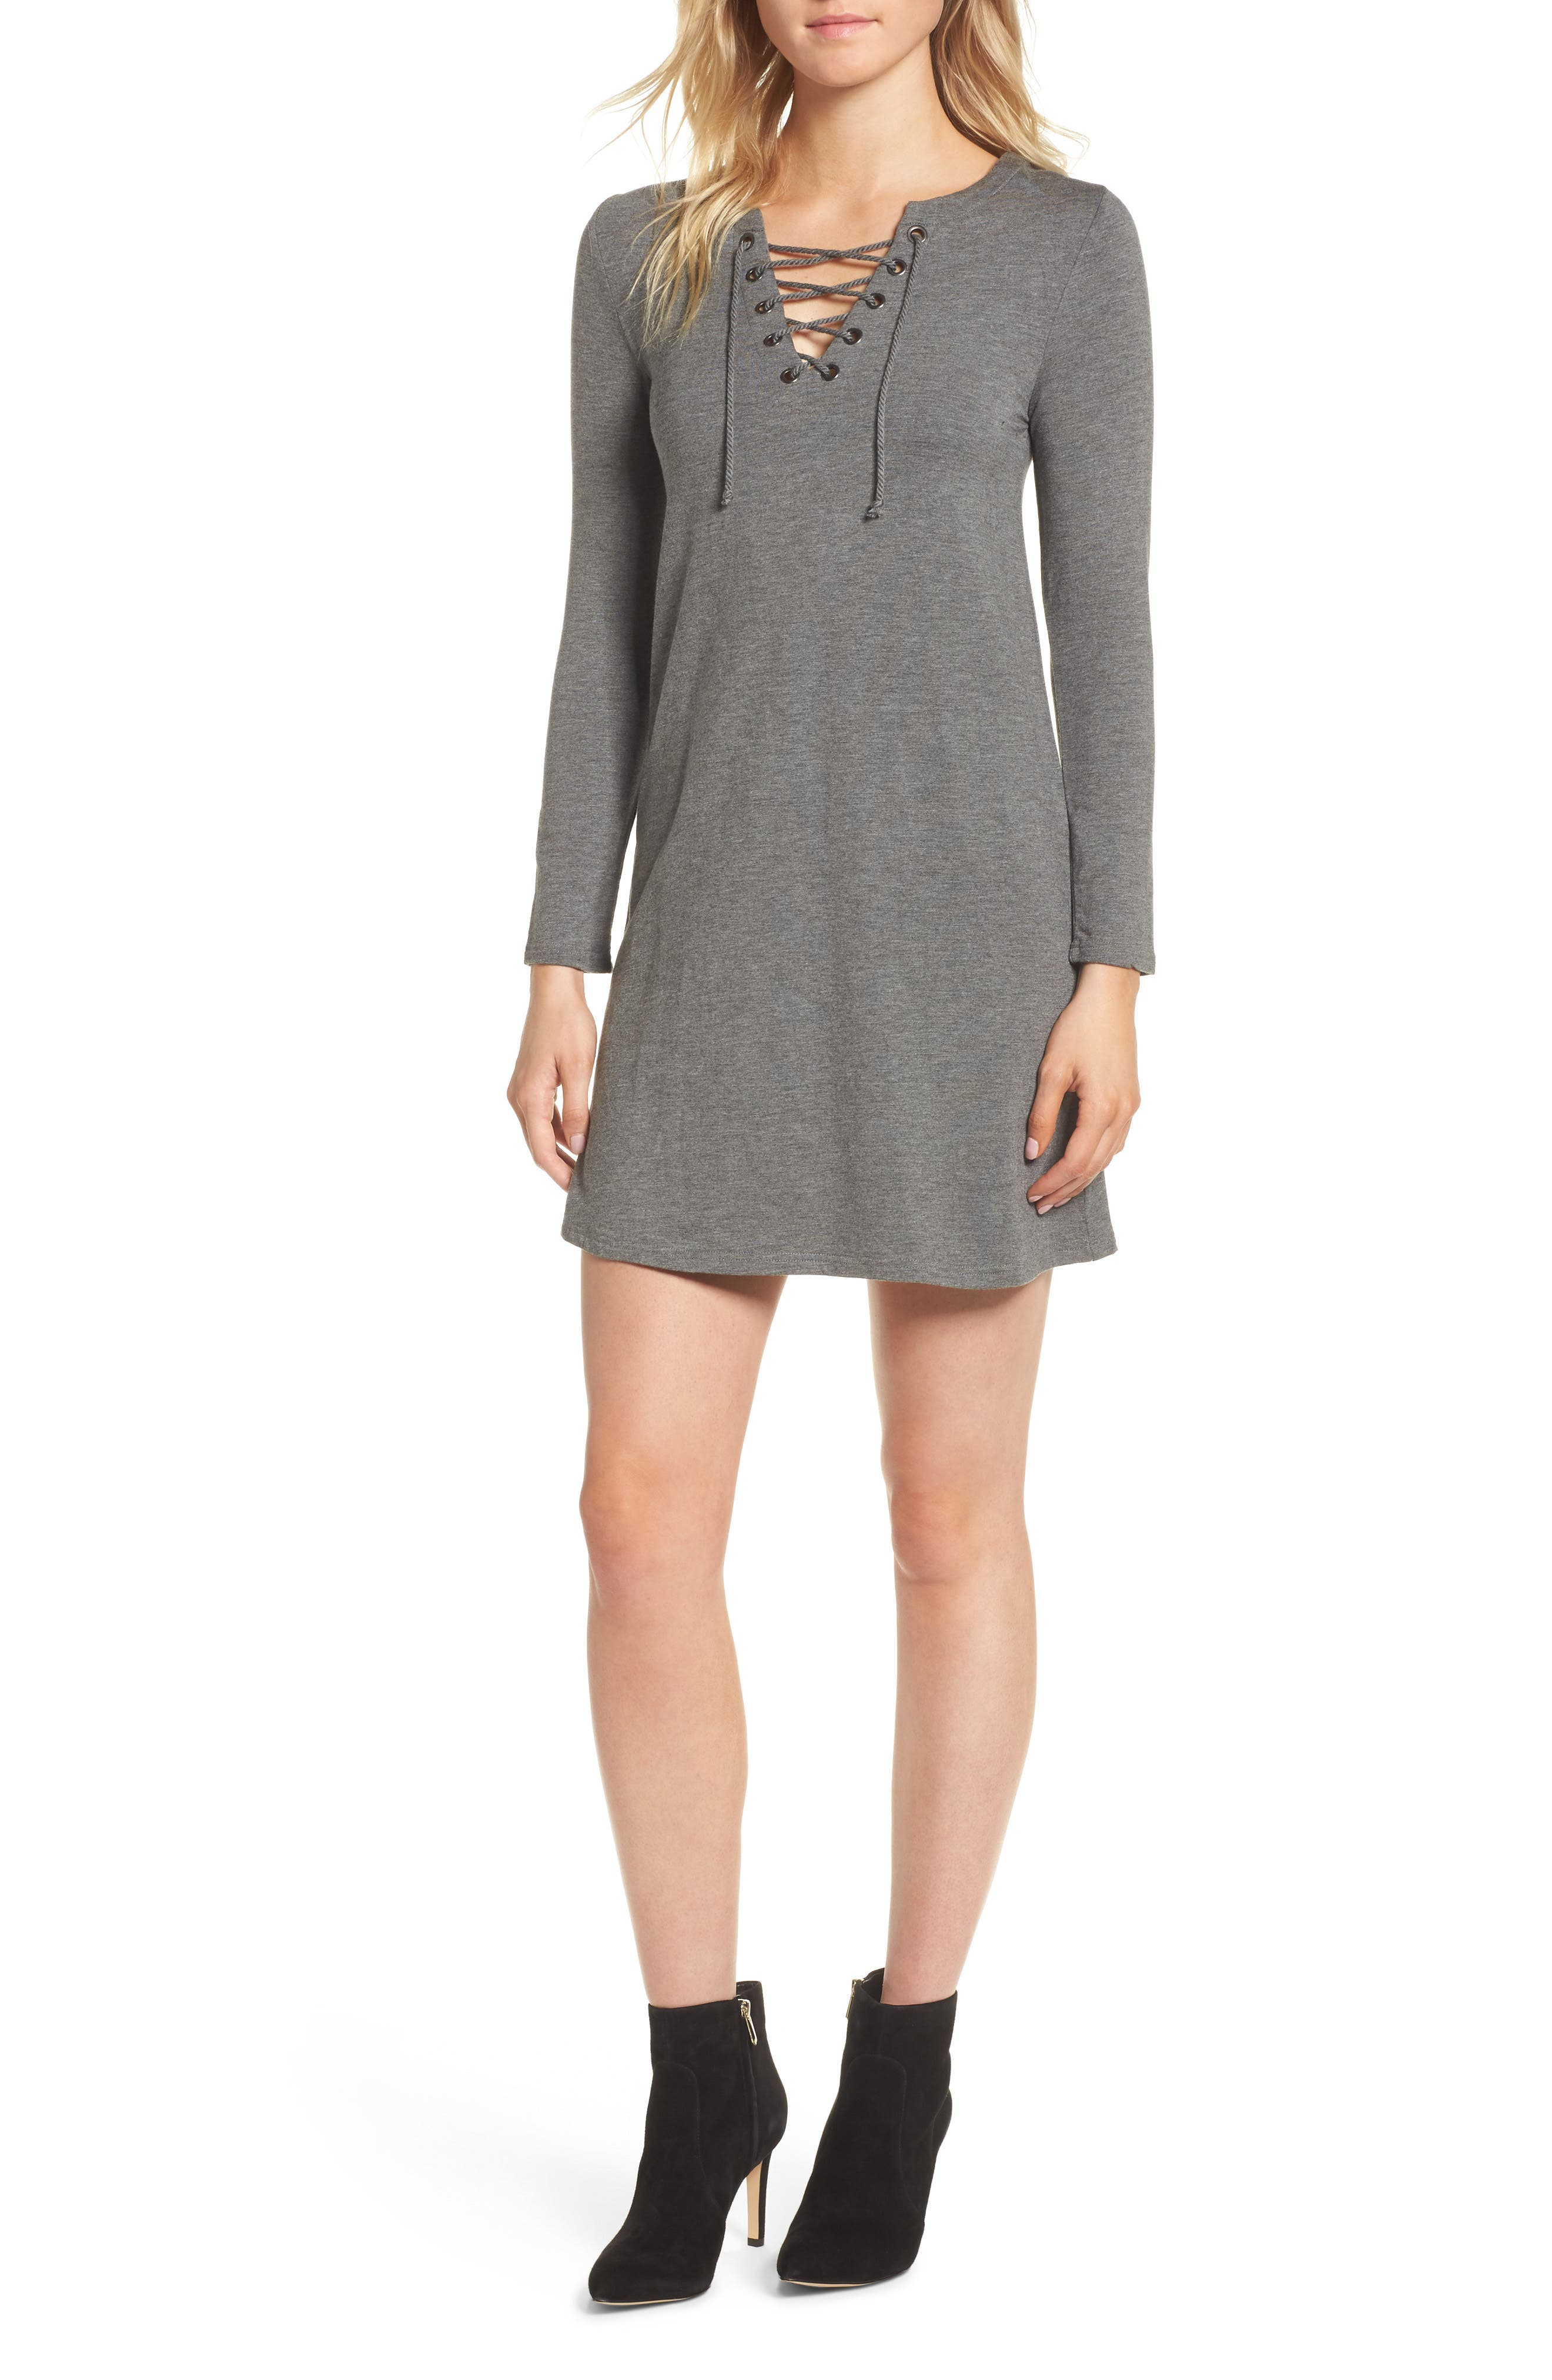 Celerina Lace-Up Minidress,                         Main,                         color, Med Heather Grey